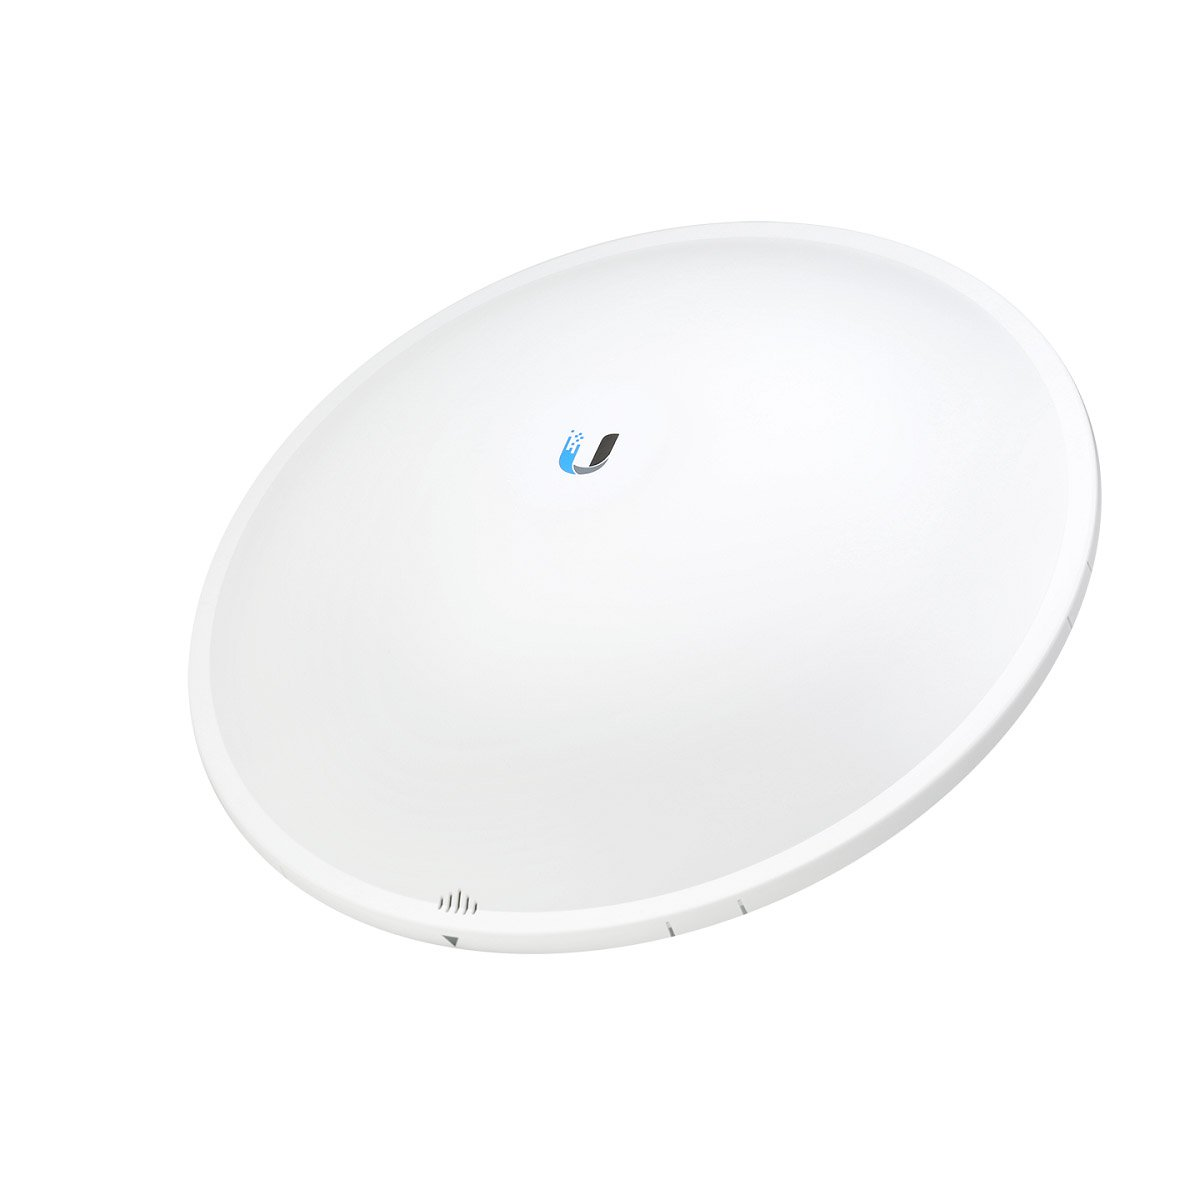 Ubiquiti PBE 5AC 500 Wifi Access Point